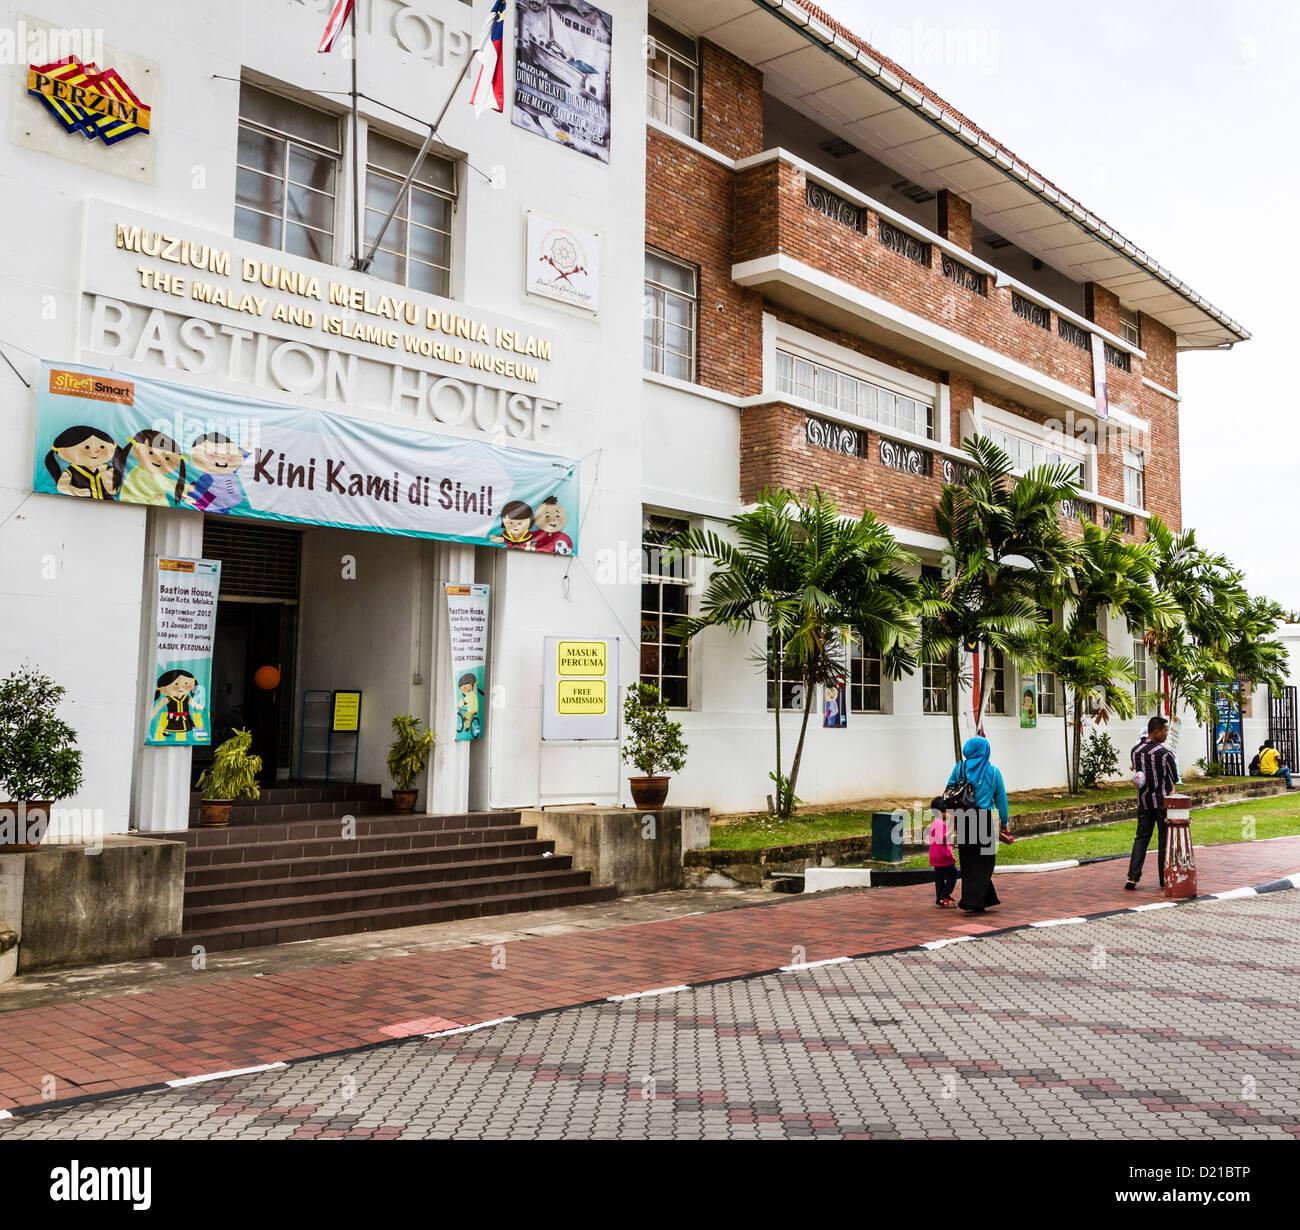 Malay and Islamic World Museum, Melaka, Malaysia - Stock Image